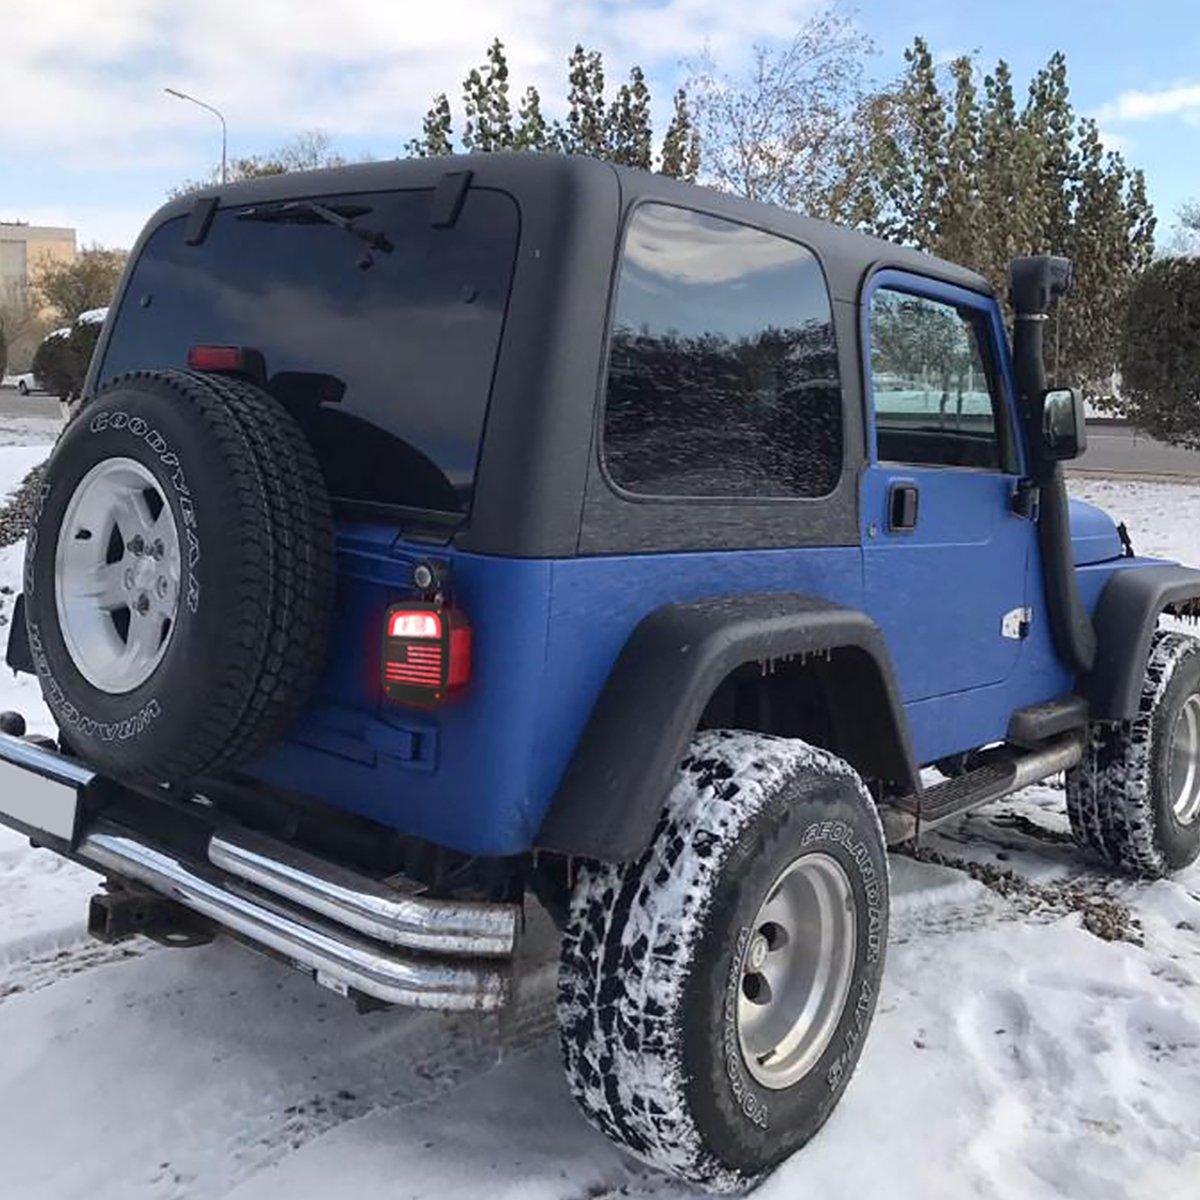 RT-TCZ Aluminum Black Rear Taillights Light Guard Tail Light Cover For 1997-2006 Jeep TJ Wrangler Pair USA Flag